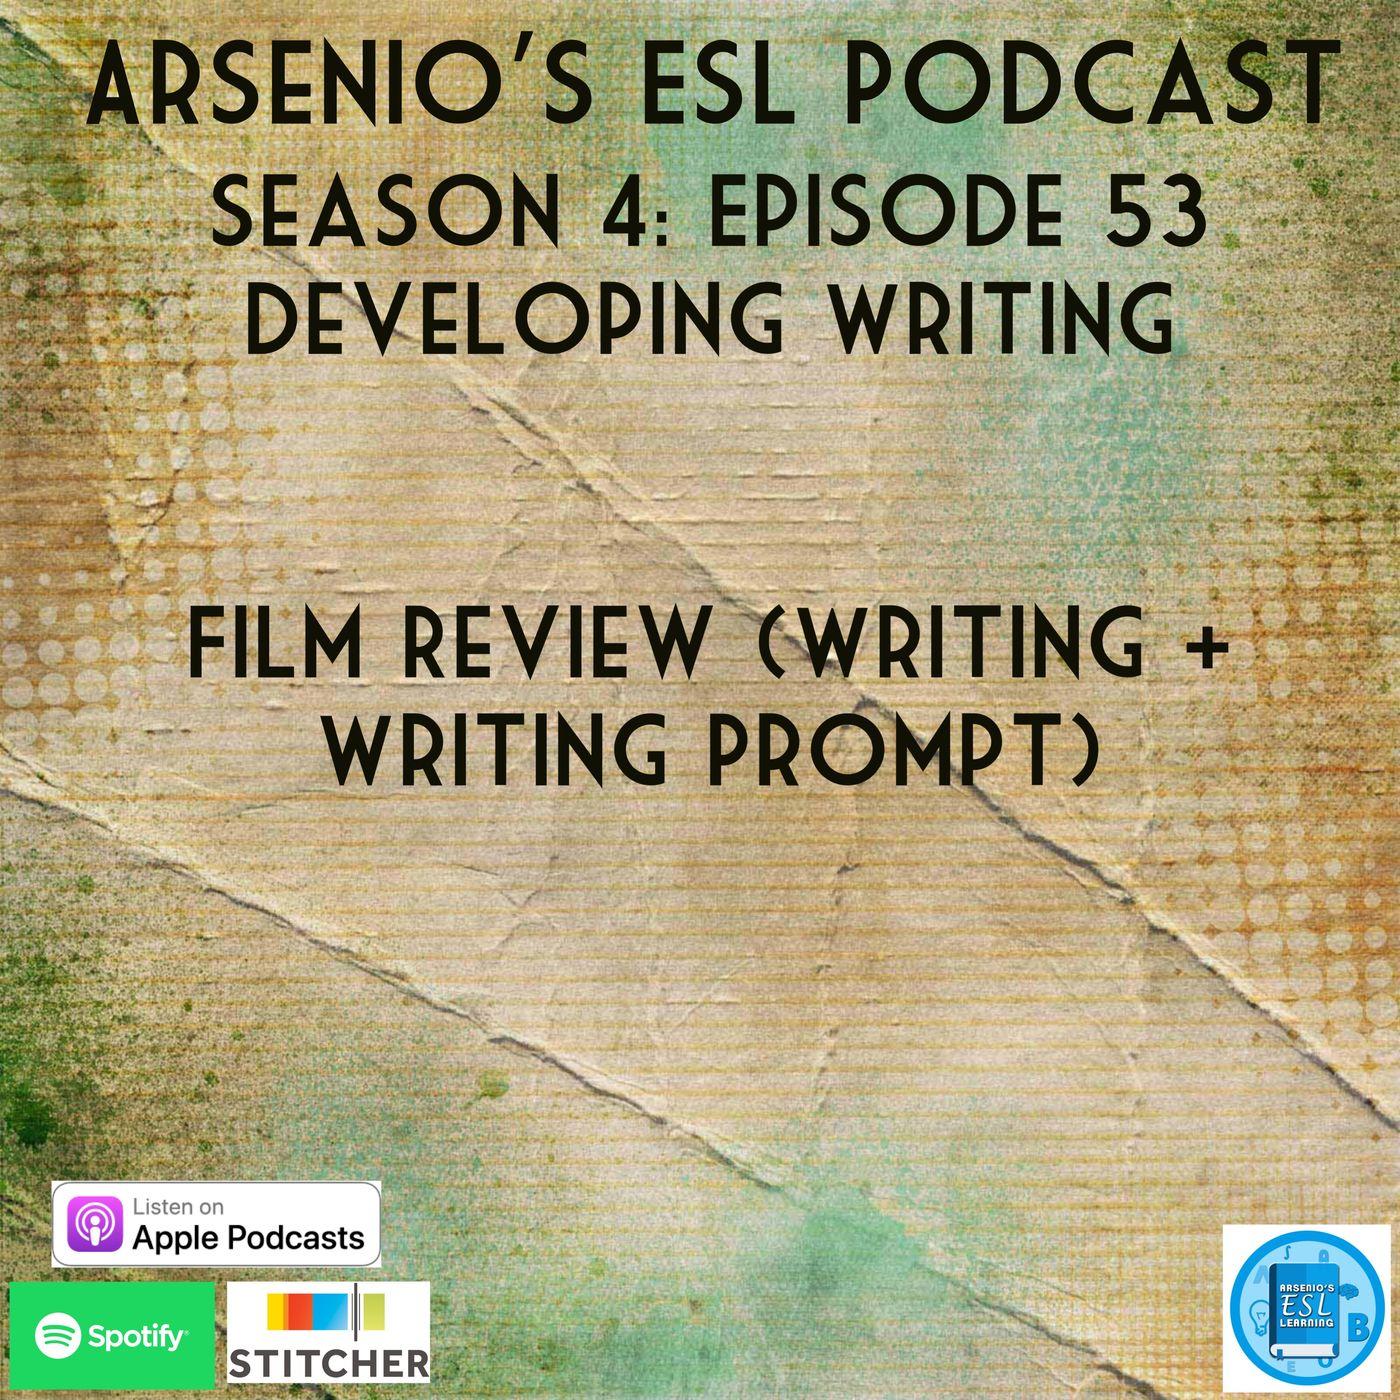 Arsenio's ESL Podcast: Season 4 - Episode 53 - Developing Writing (Writing Version)